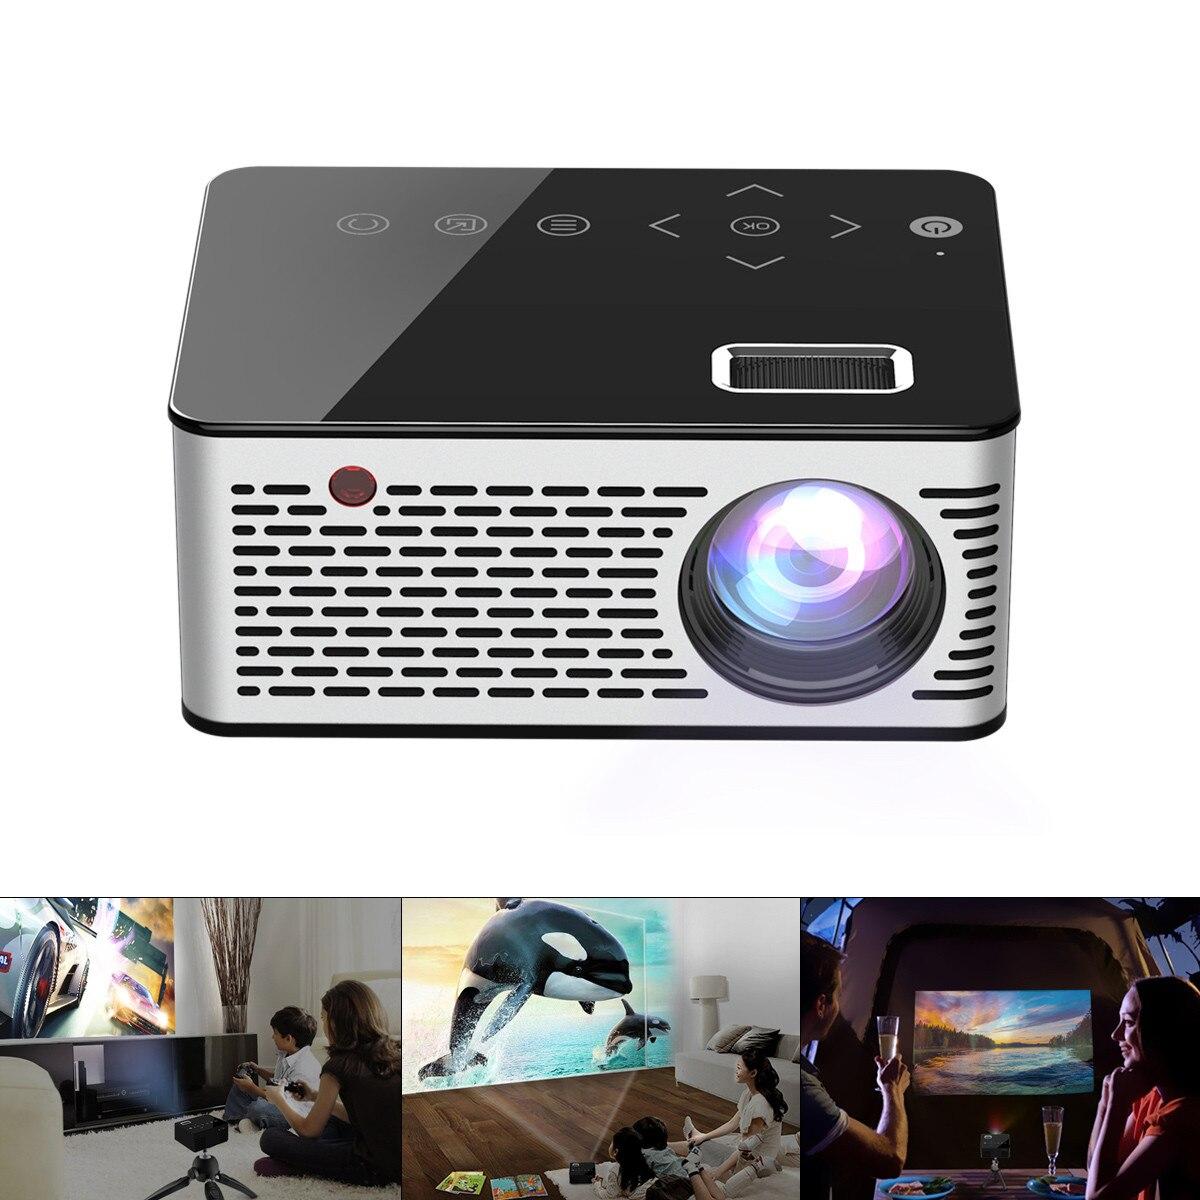 T260 Universal 116 pulgadas portátil Mini proyector LCD AV USB HDMI Home Theater foto música película proyector con botón táctil